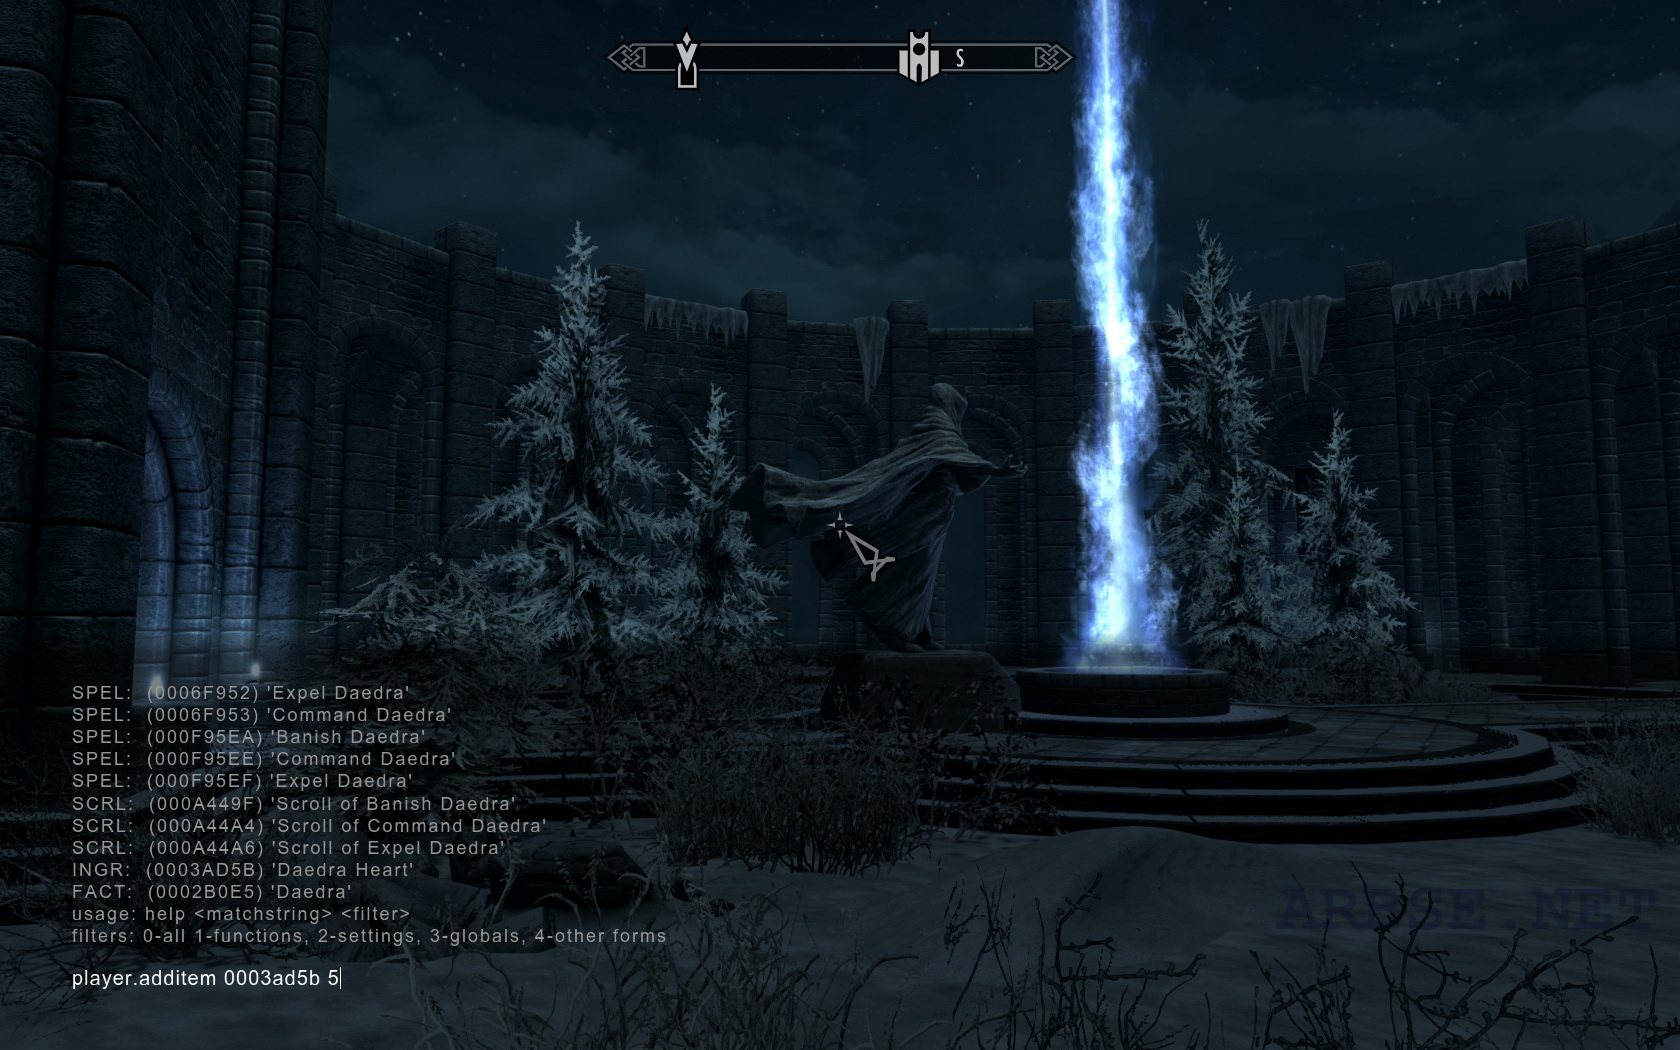 The elder scrolls 4 oblivion коды предметов